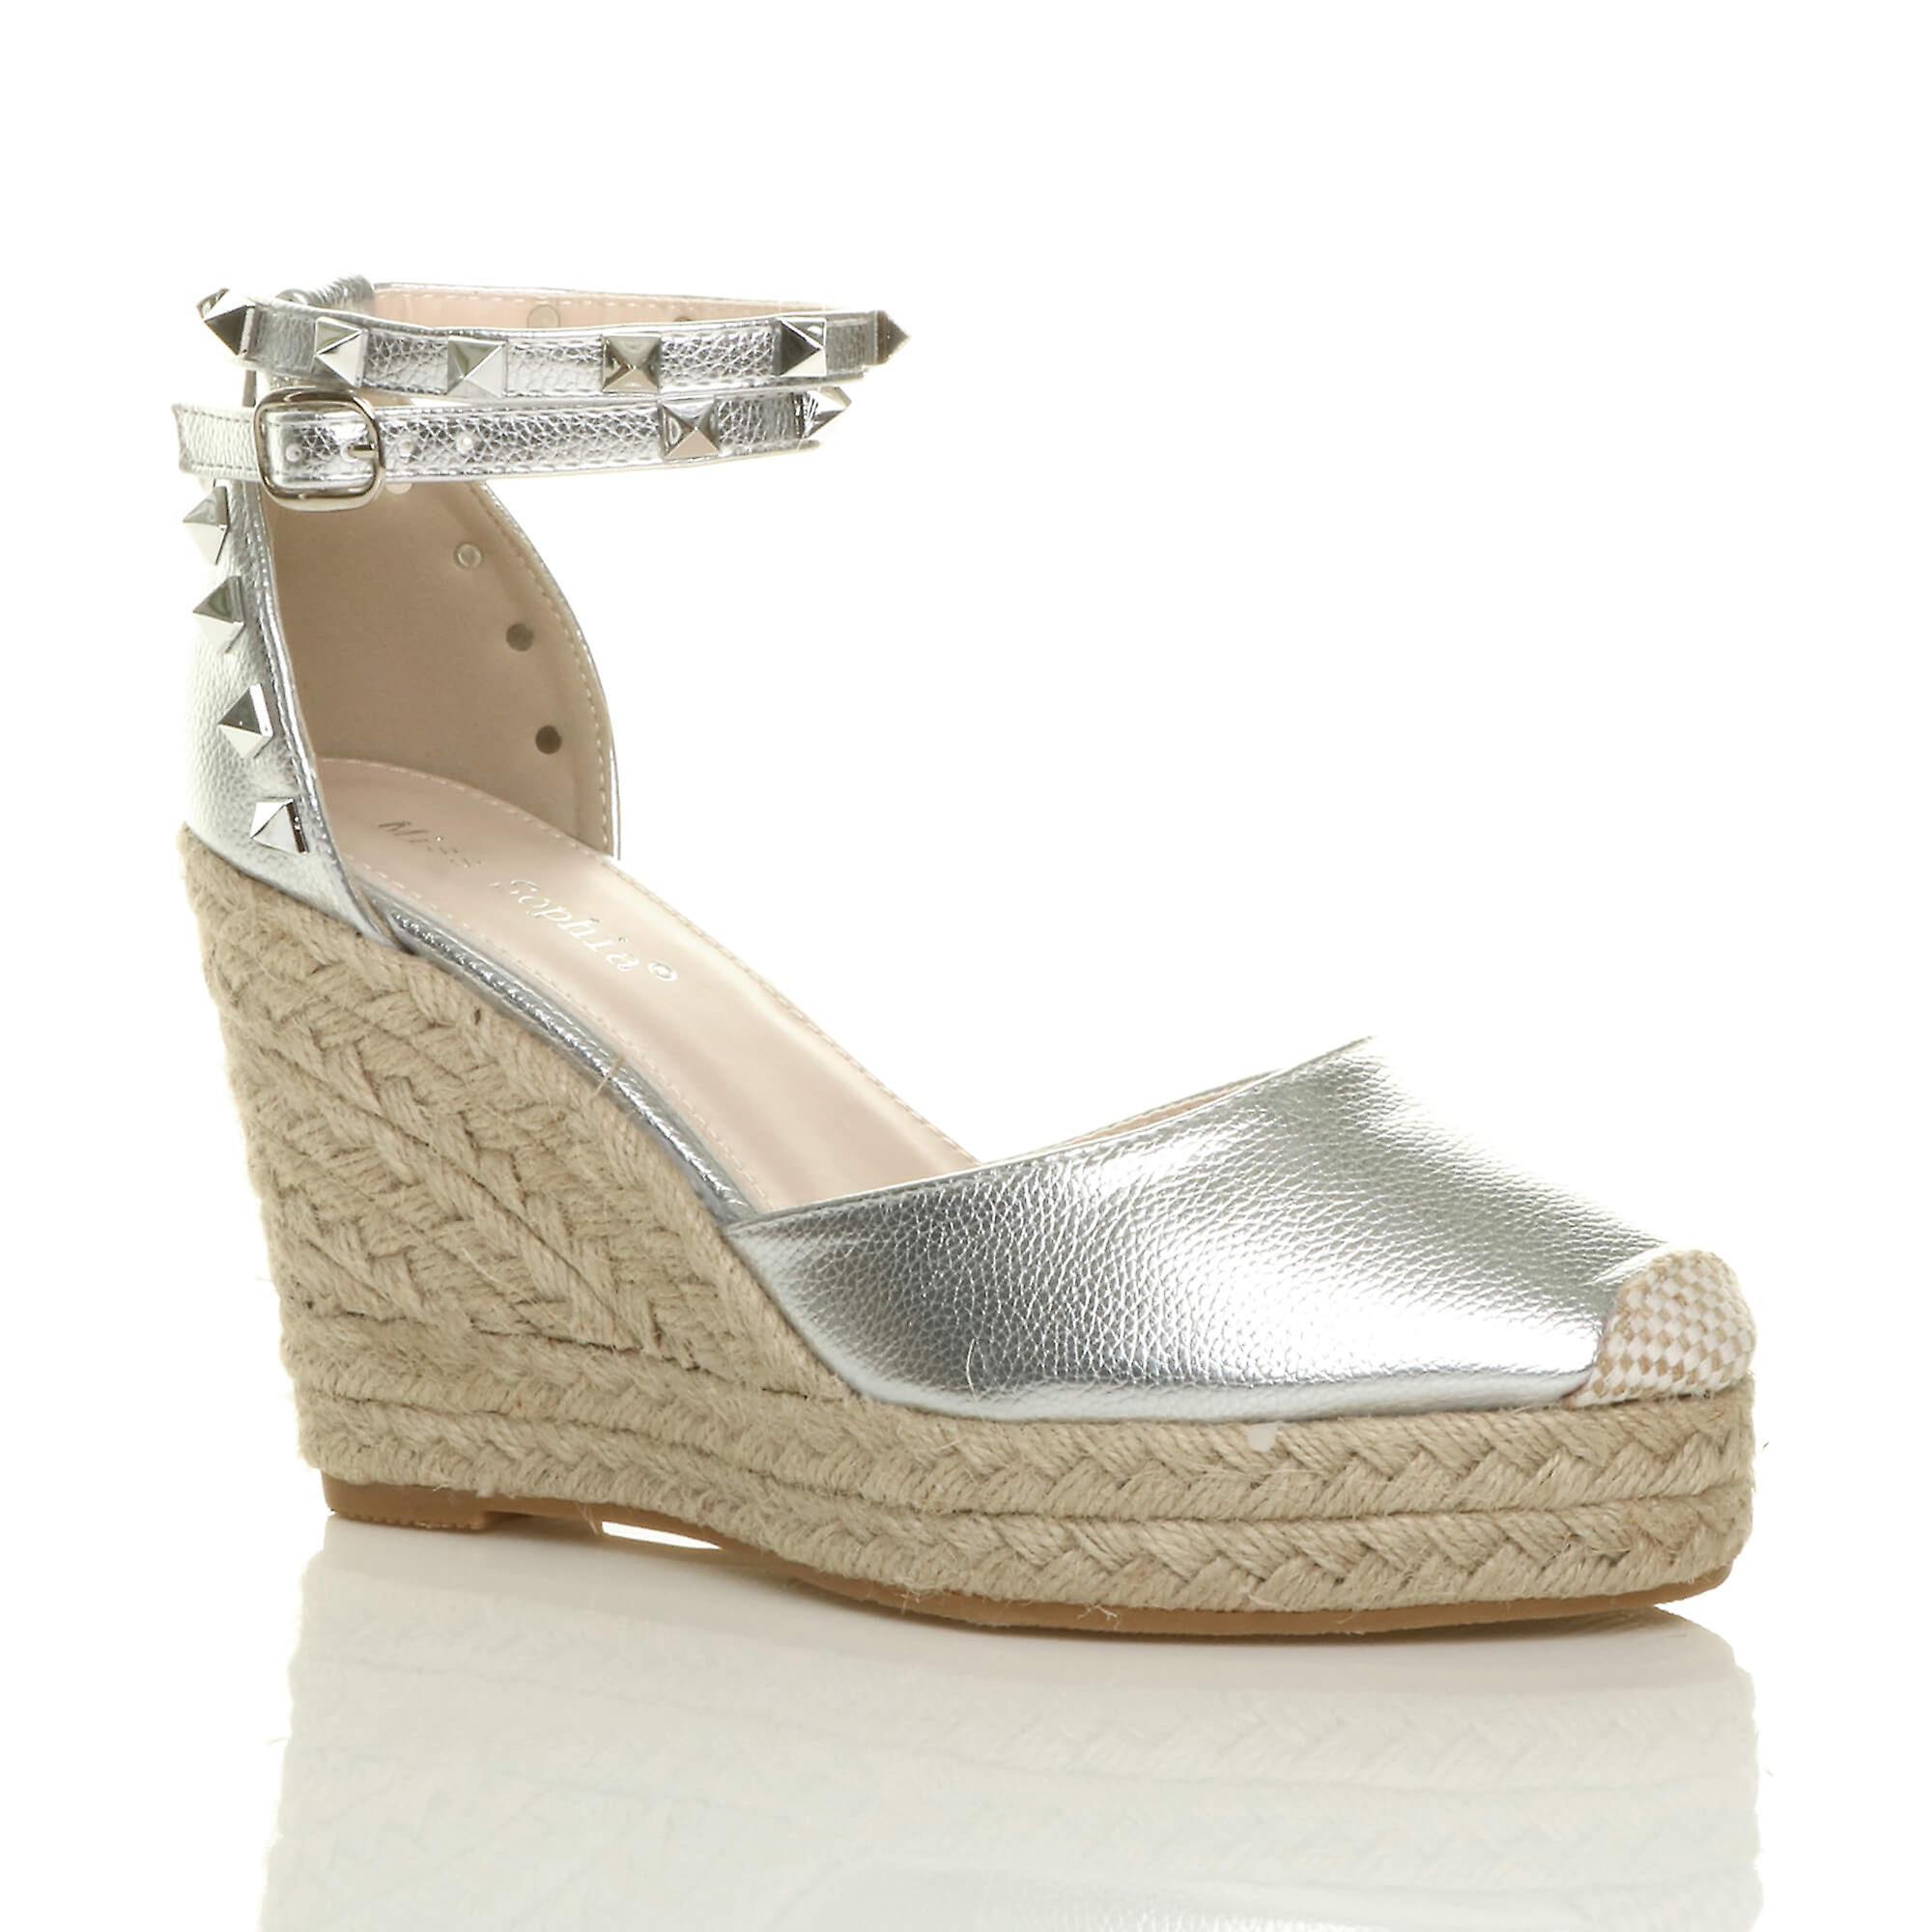 nuevo estilo 5349c 12f0b Ajvani mujer alta cuña tobillo correa alpargatas zapatos sandalias de tacón  tachonado